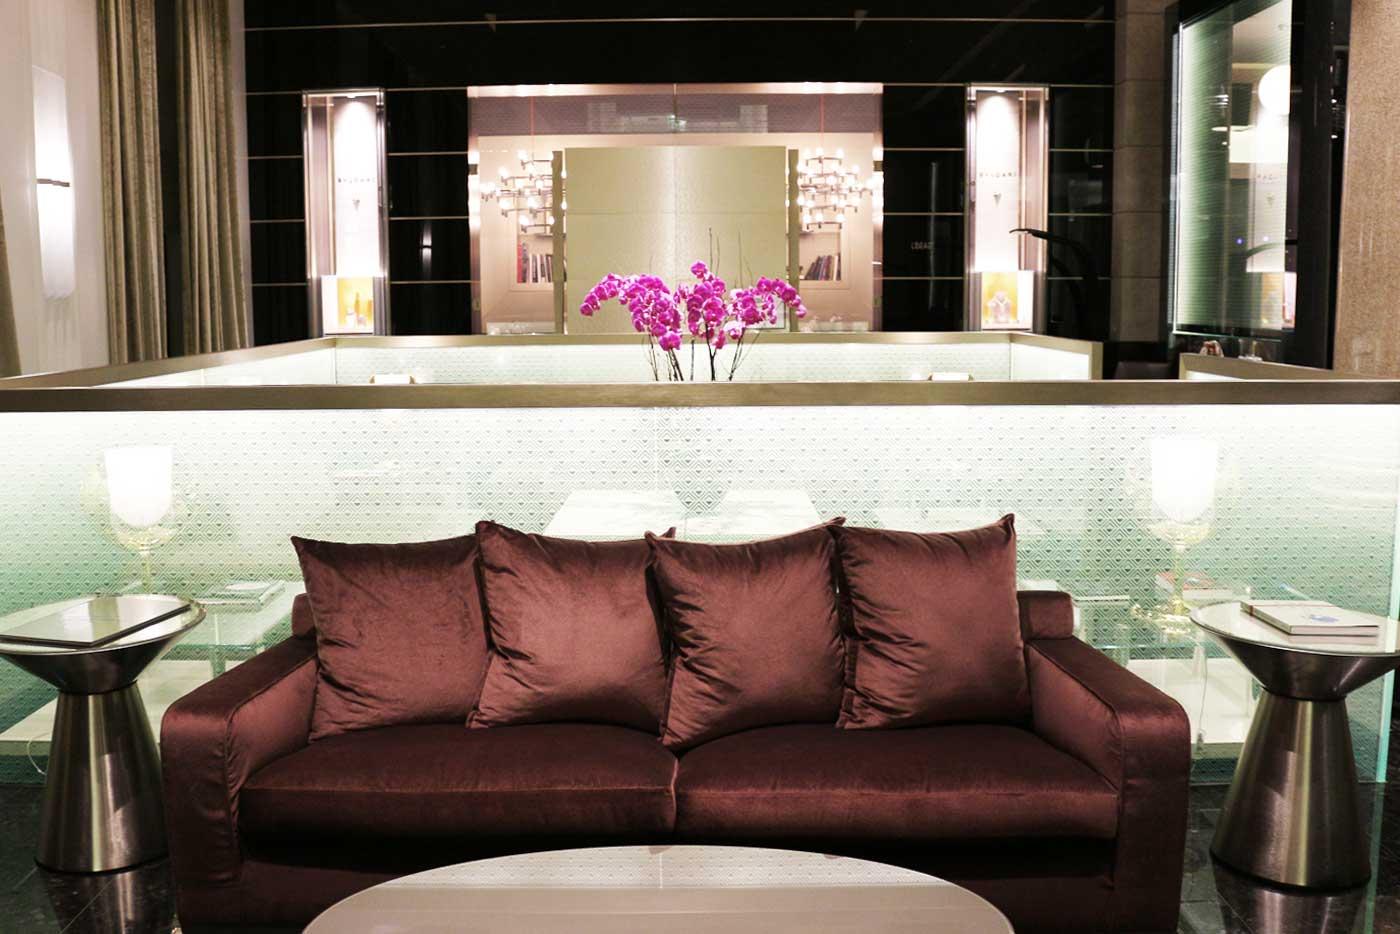 Excelsior-Hotel-Gallia-img-post-2